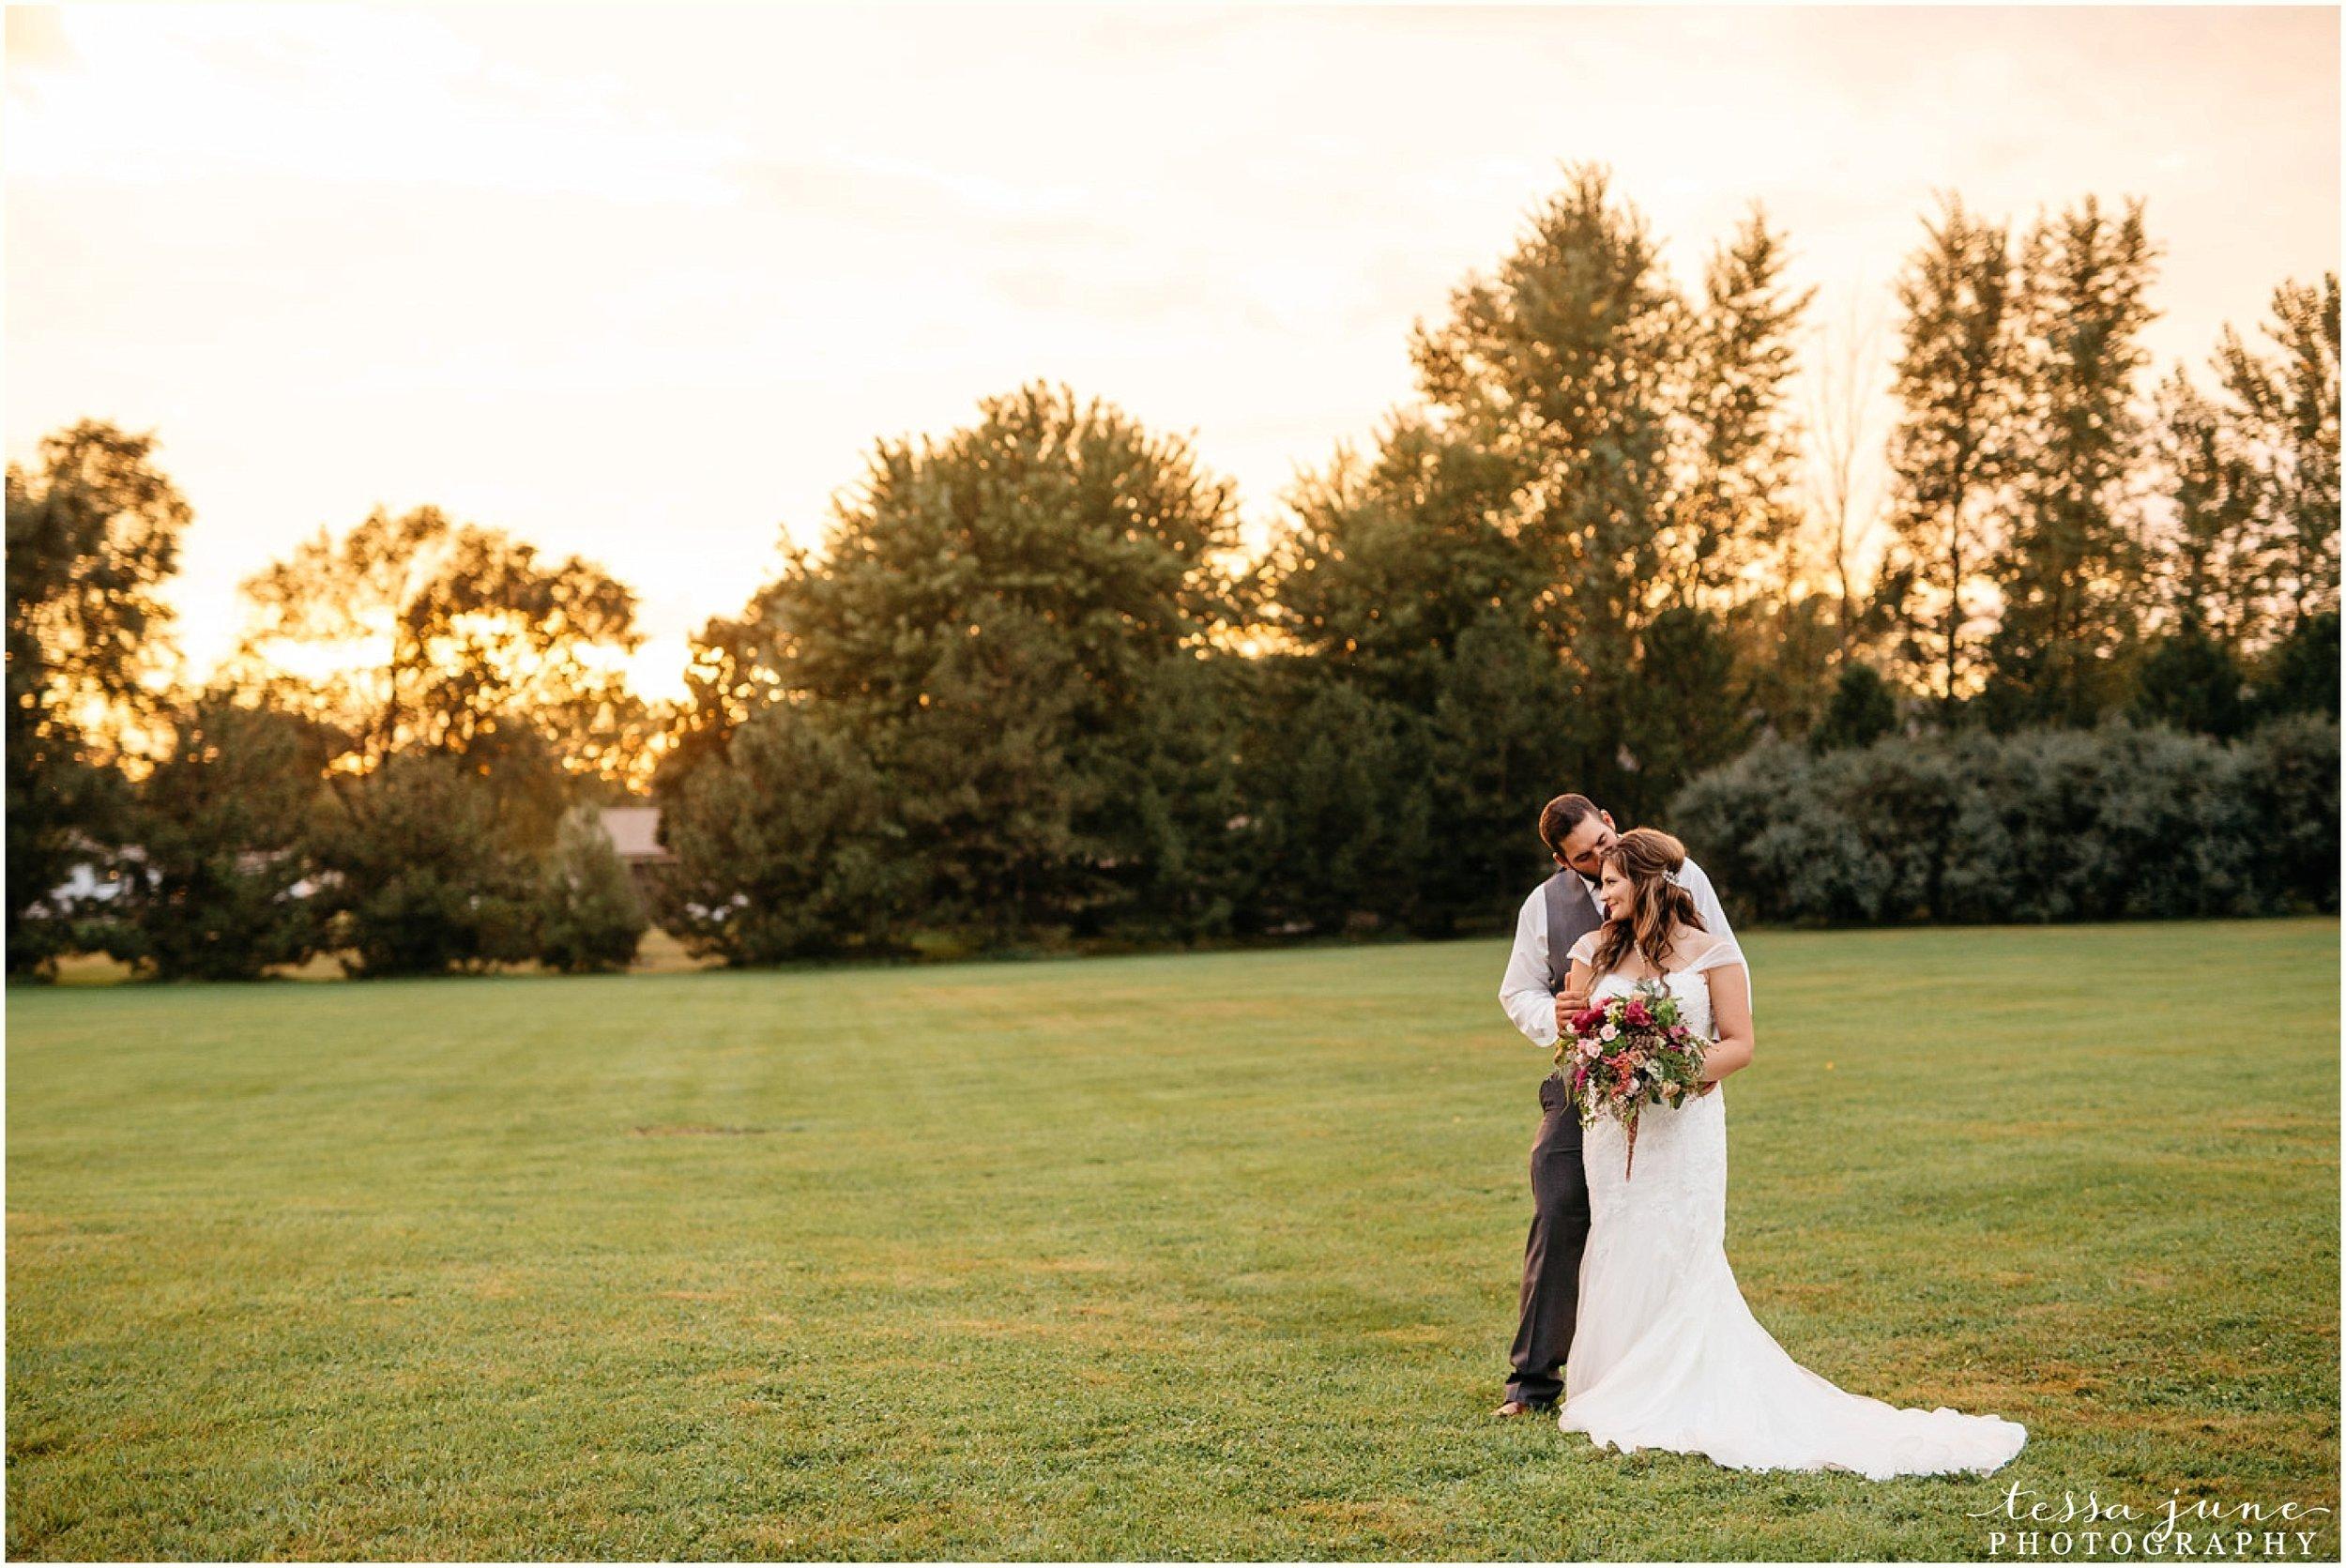 bohemian-minnesota-wedding-mismatched-bridesmaid-dresses-waterfall-st-cloud-tessa-june-photography-185.jpg